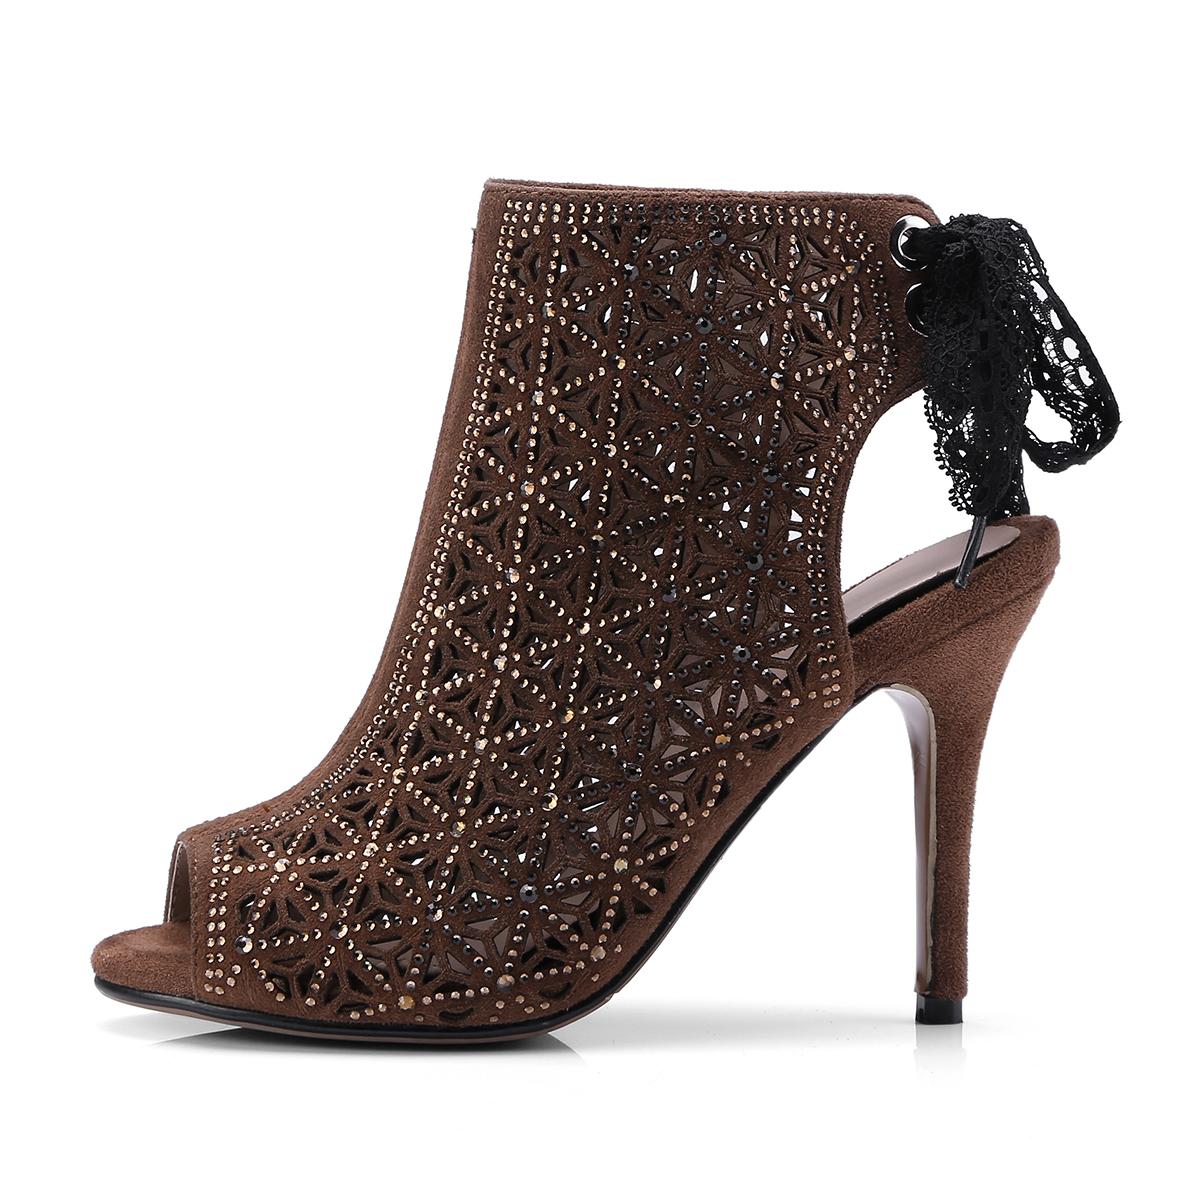 e7380cf2d510 Arden Furtado 2018 summer boots high heels 9cm stilettos peep toe small  size 32 33 fretwork lace up fashion sexy sandals shoes Item NO  MLA514